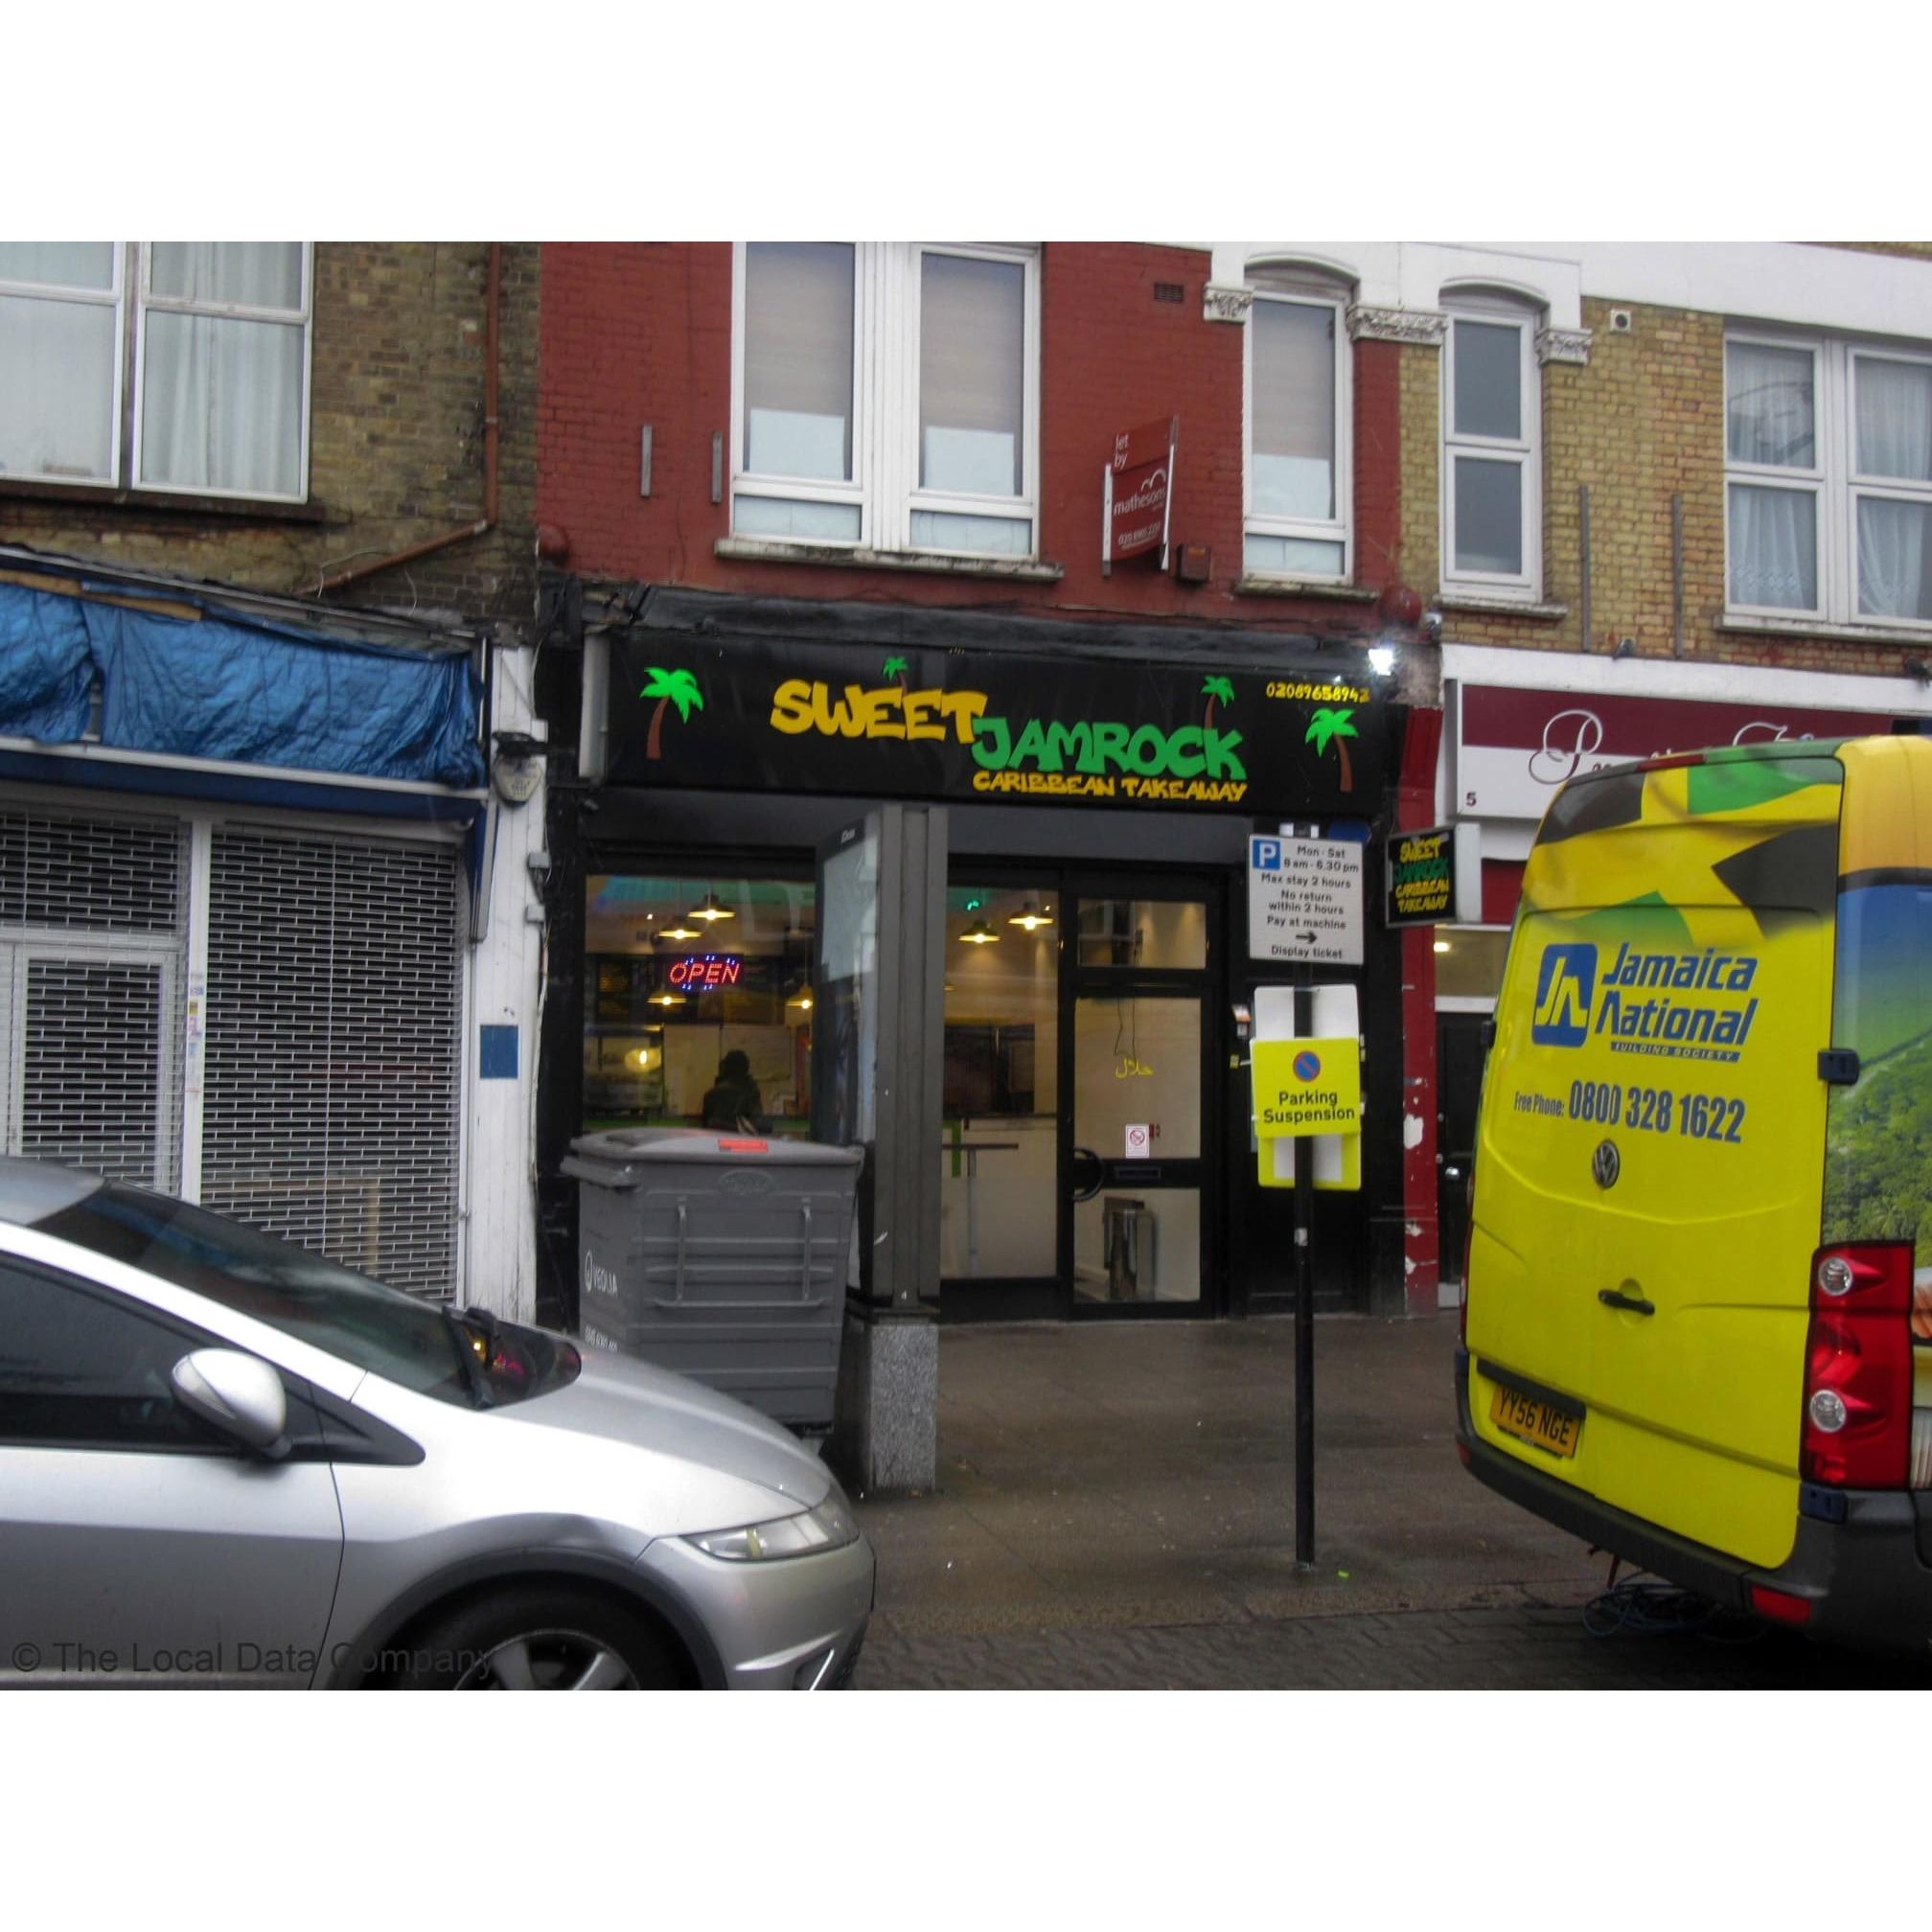 Sweet Jamrock Restaurant Ltd - London, London NW10 8SE - 020 8965 8942 | ShowMeLocal.com